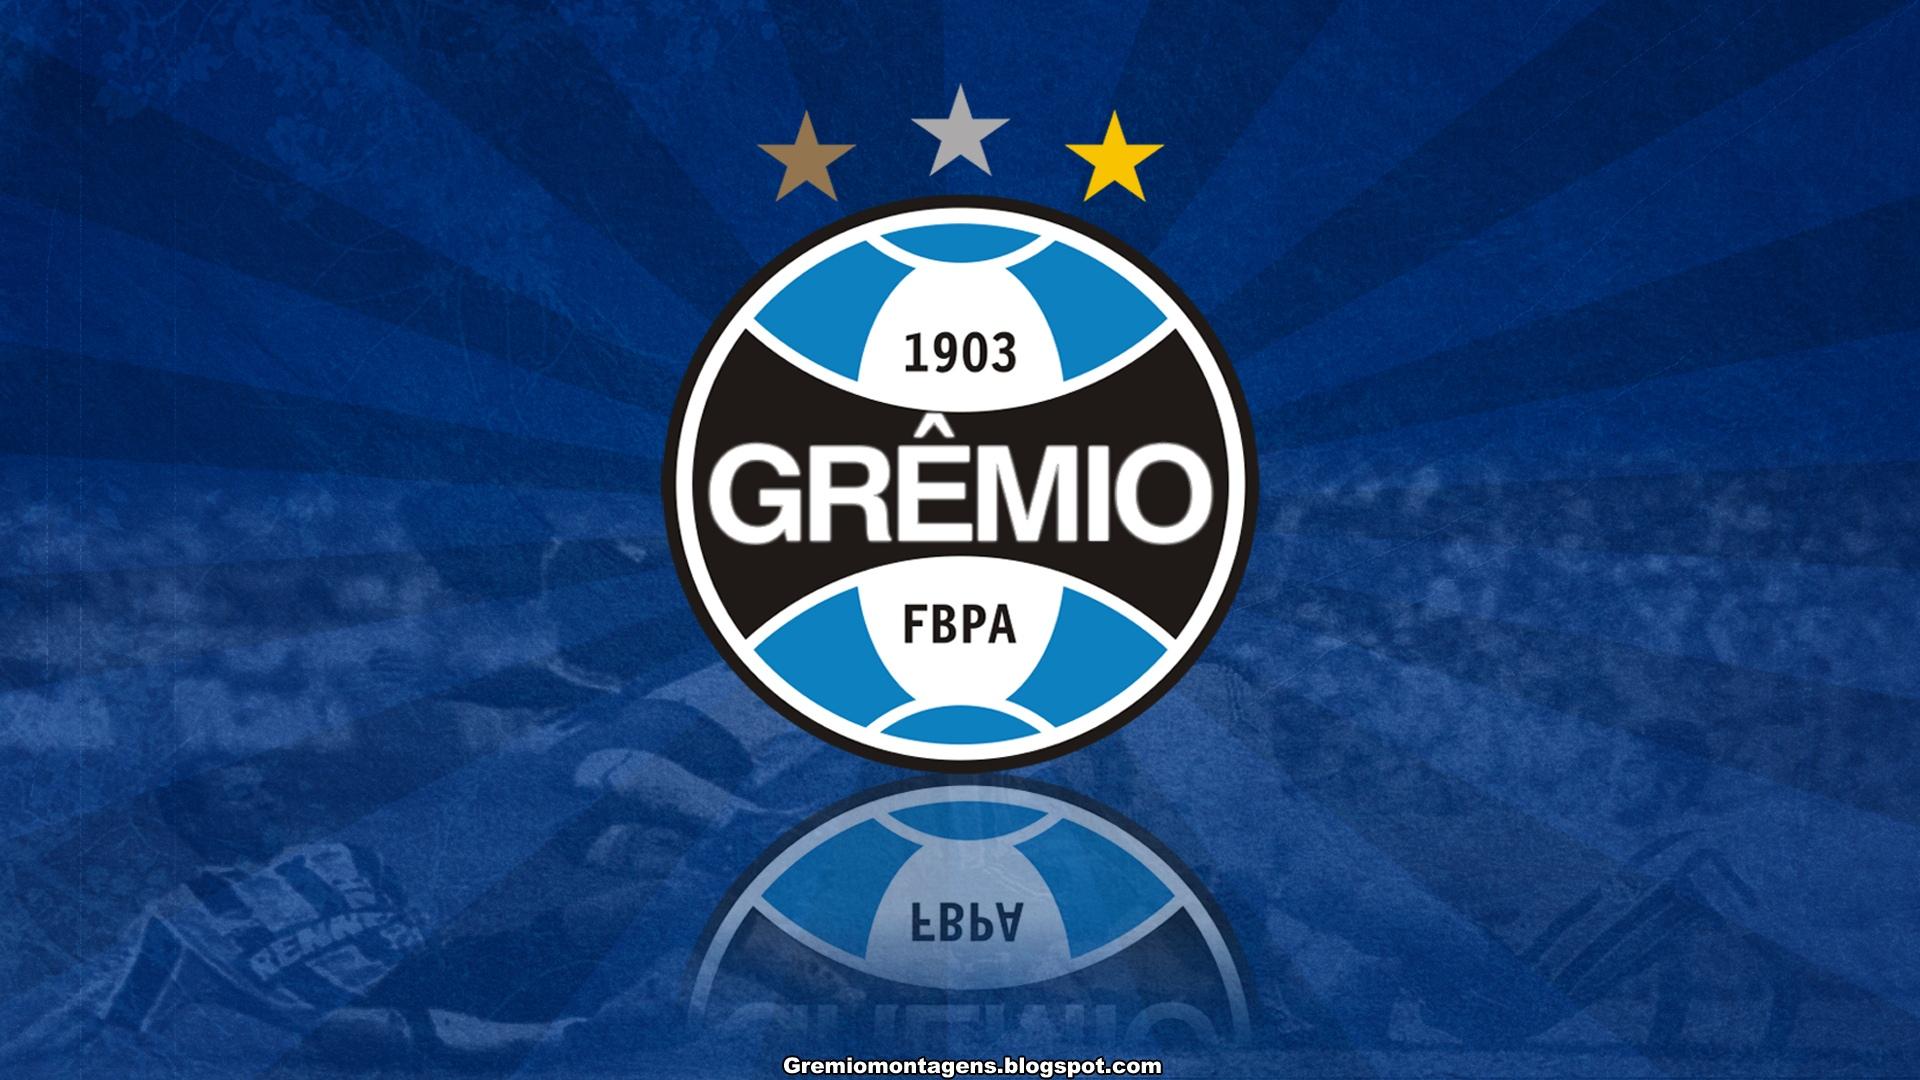 Gremio HD wallpaper 1920x1080